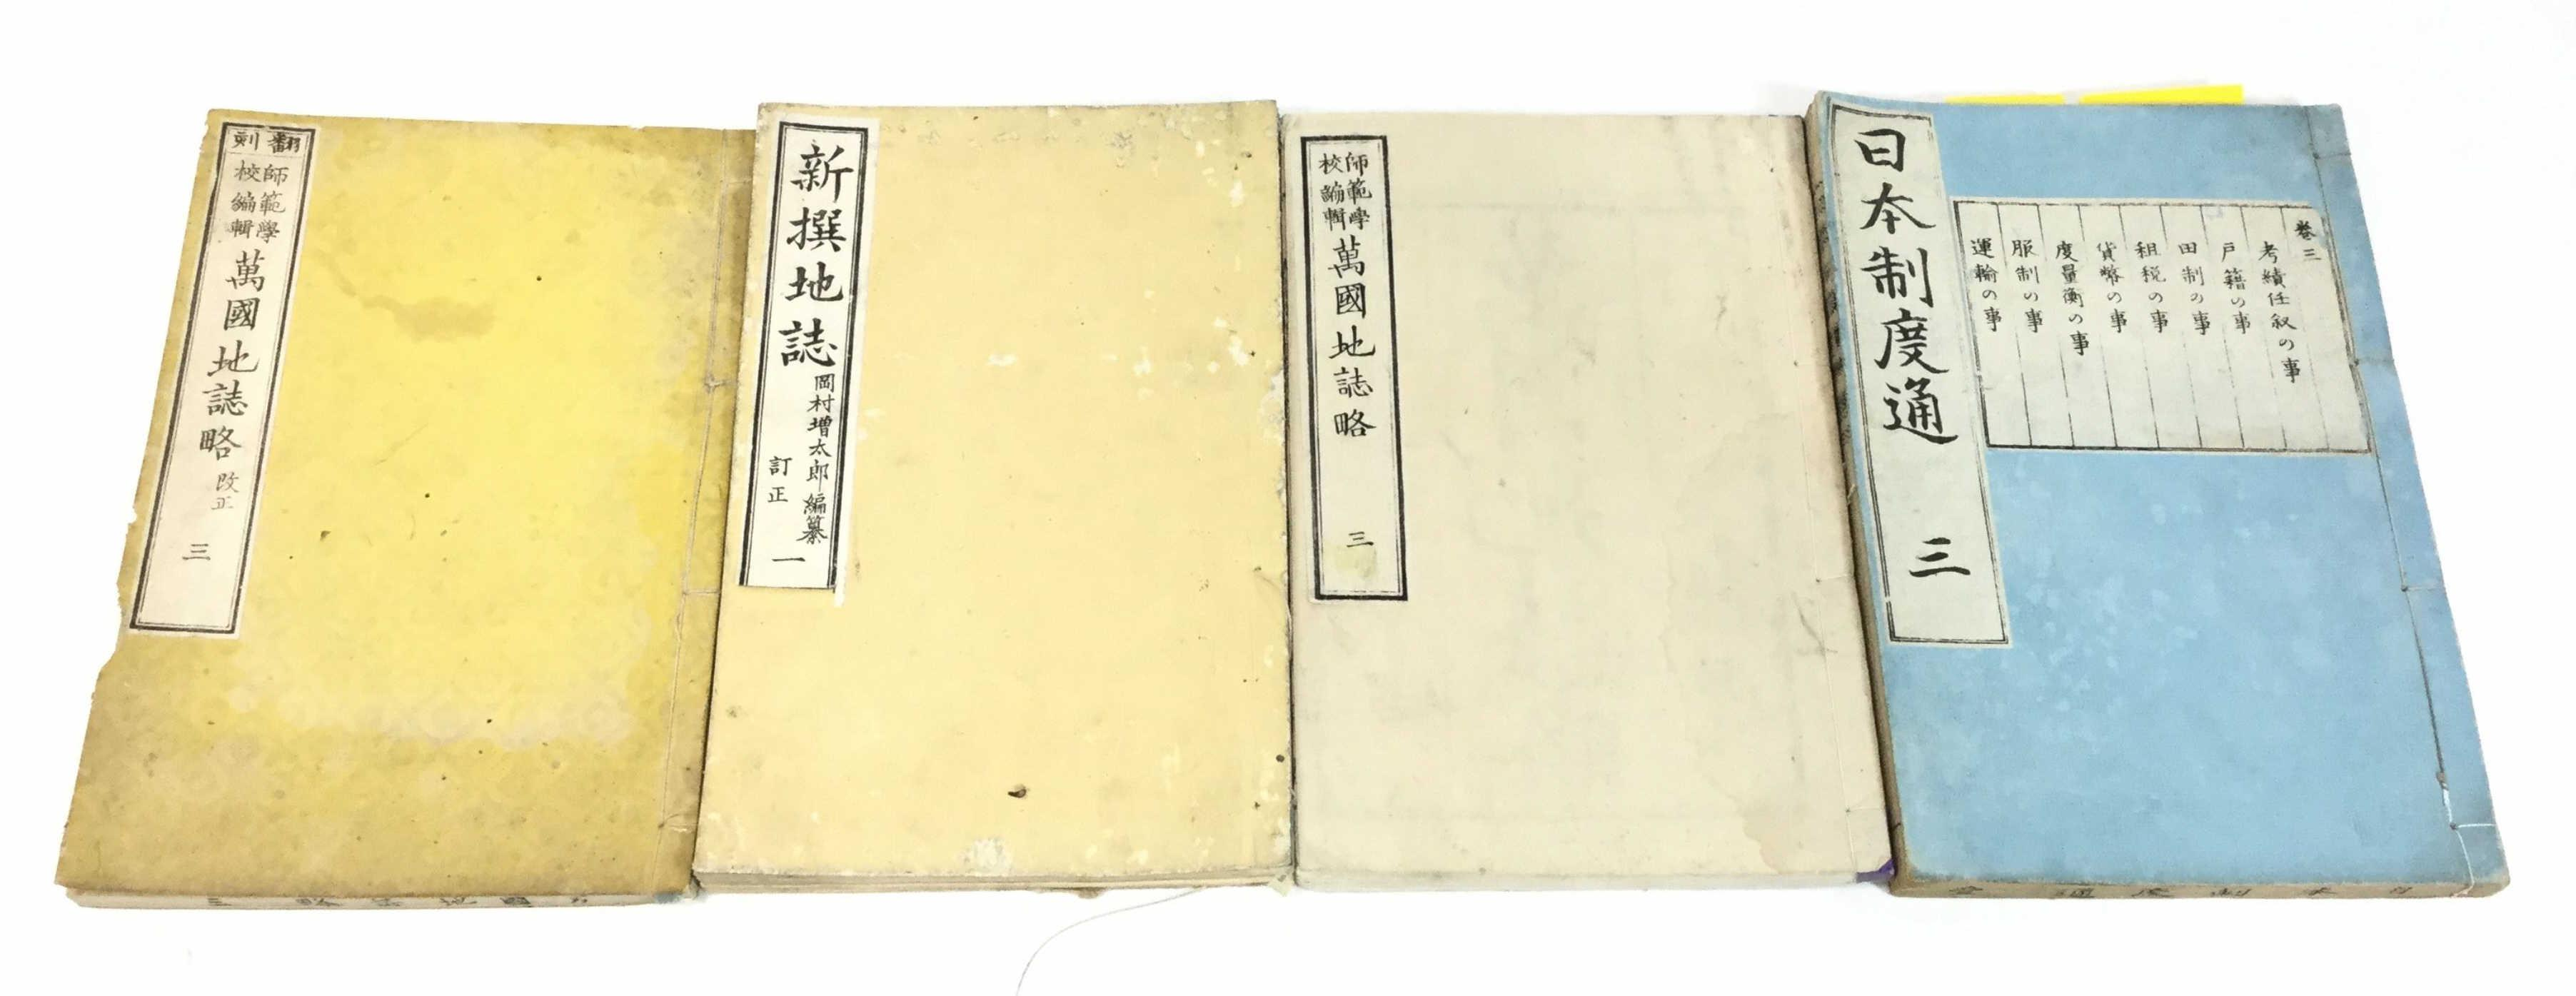 (14) 19th C. Japanese Woodblock Print Books